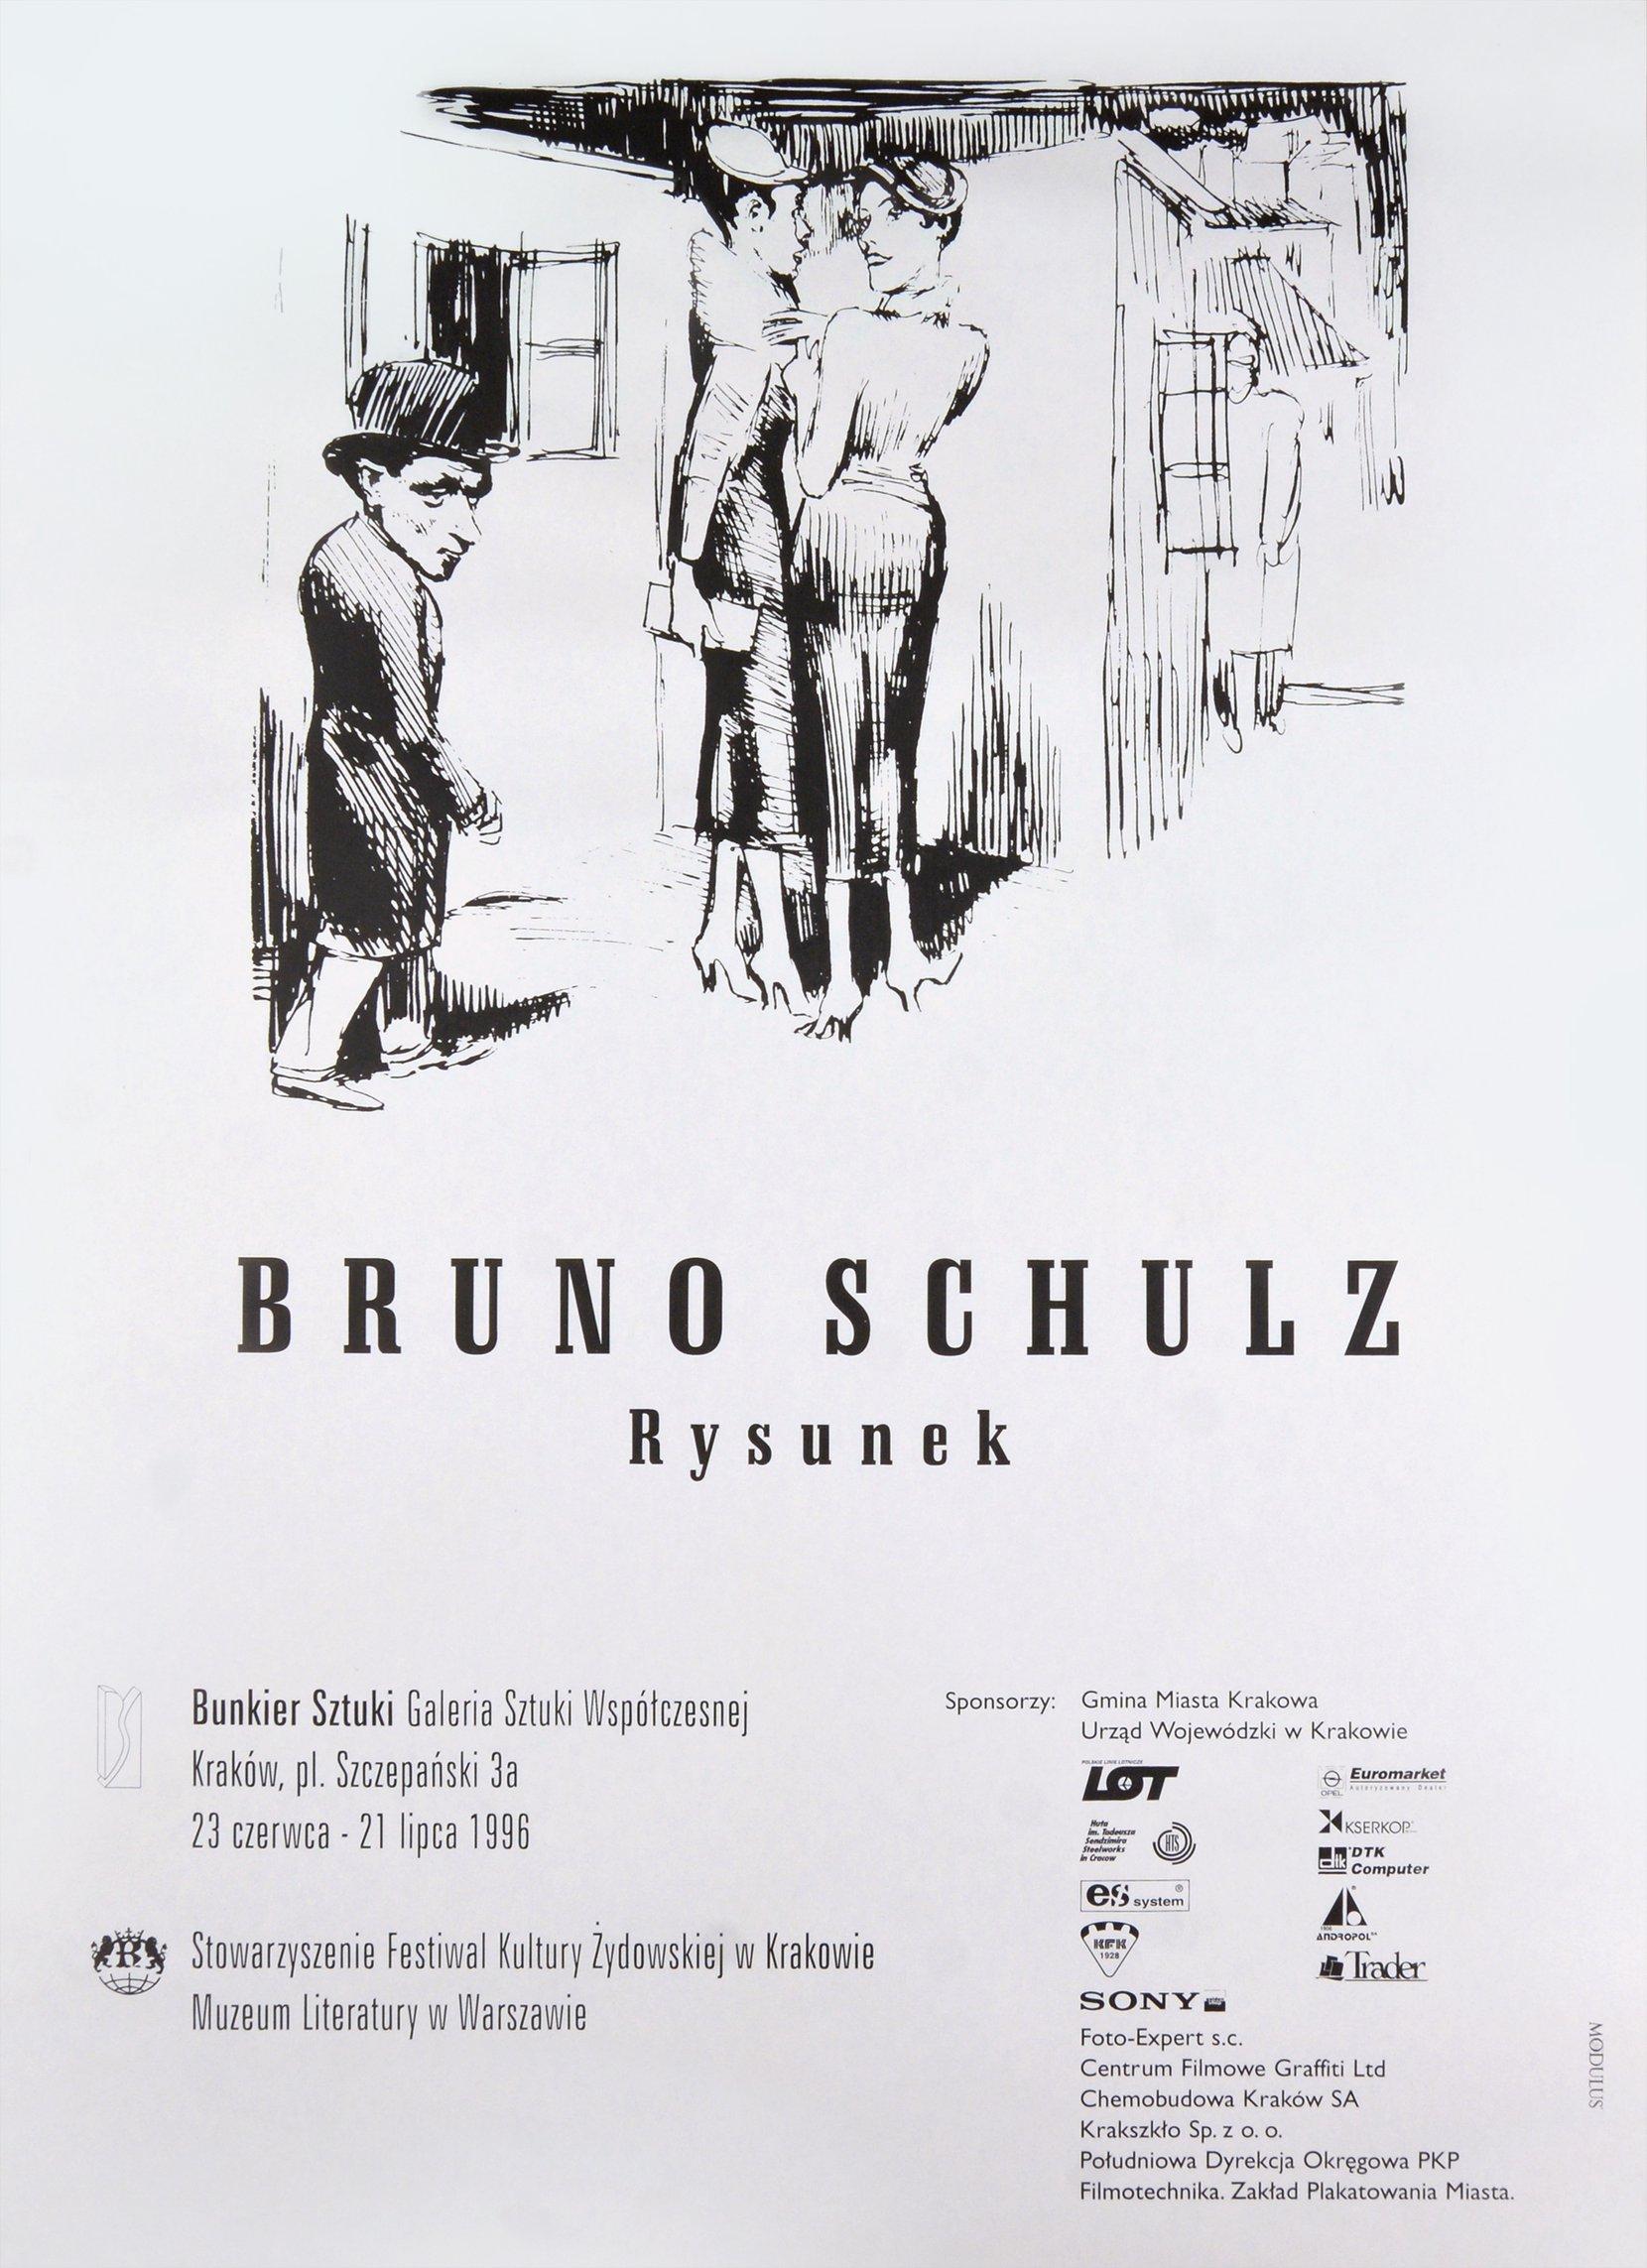 bruno schulz, rysunek, 1996 posters art posters MODULUS.agency